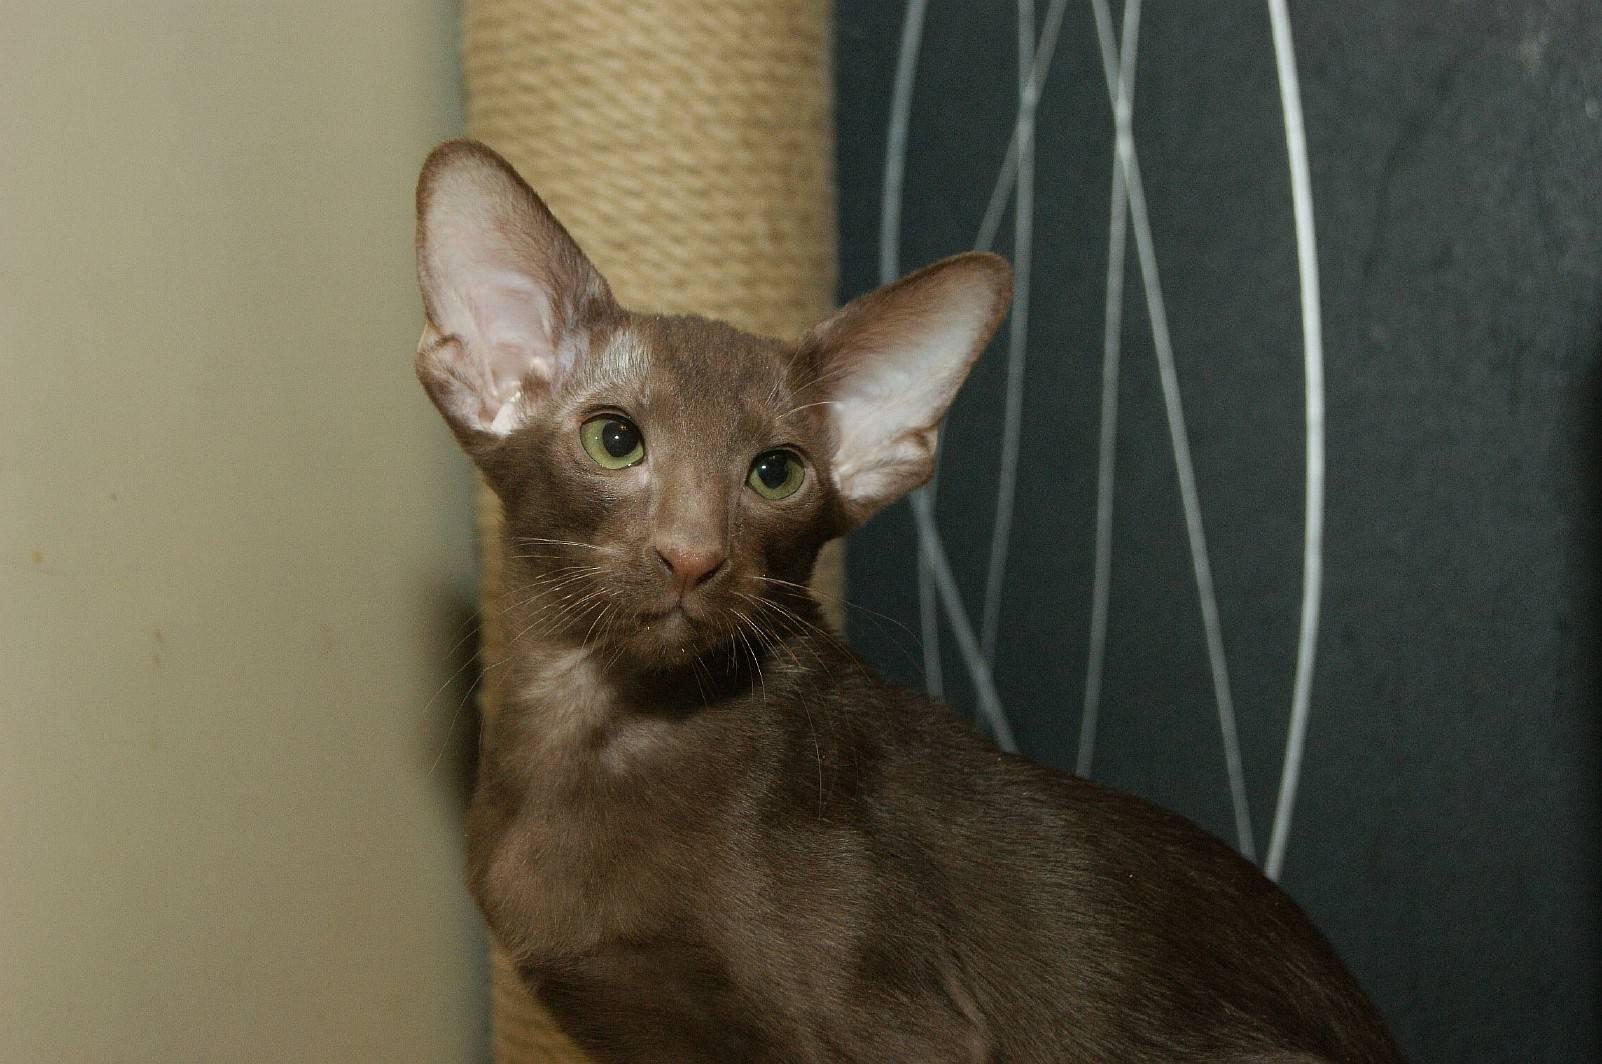 Кот грузин или кошки, похожие на грузинов